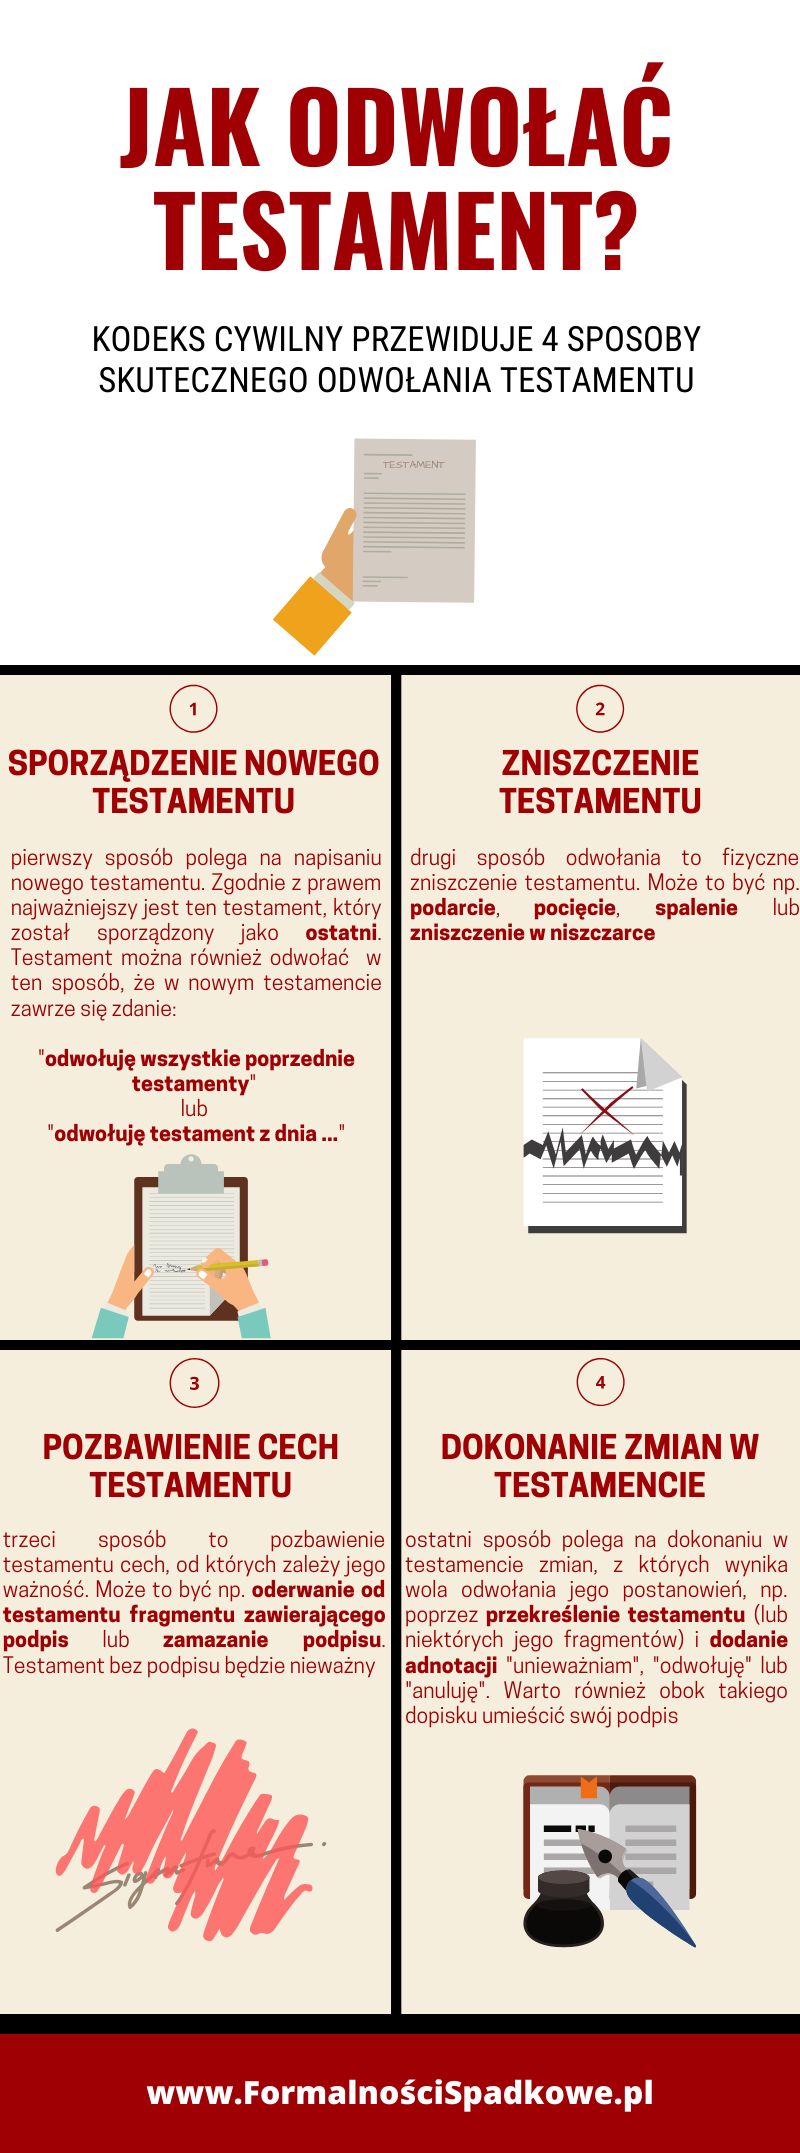 infografika jak odwołać testament